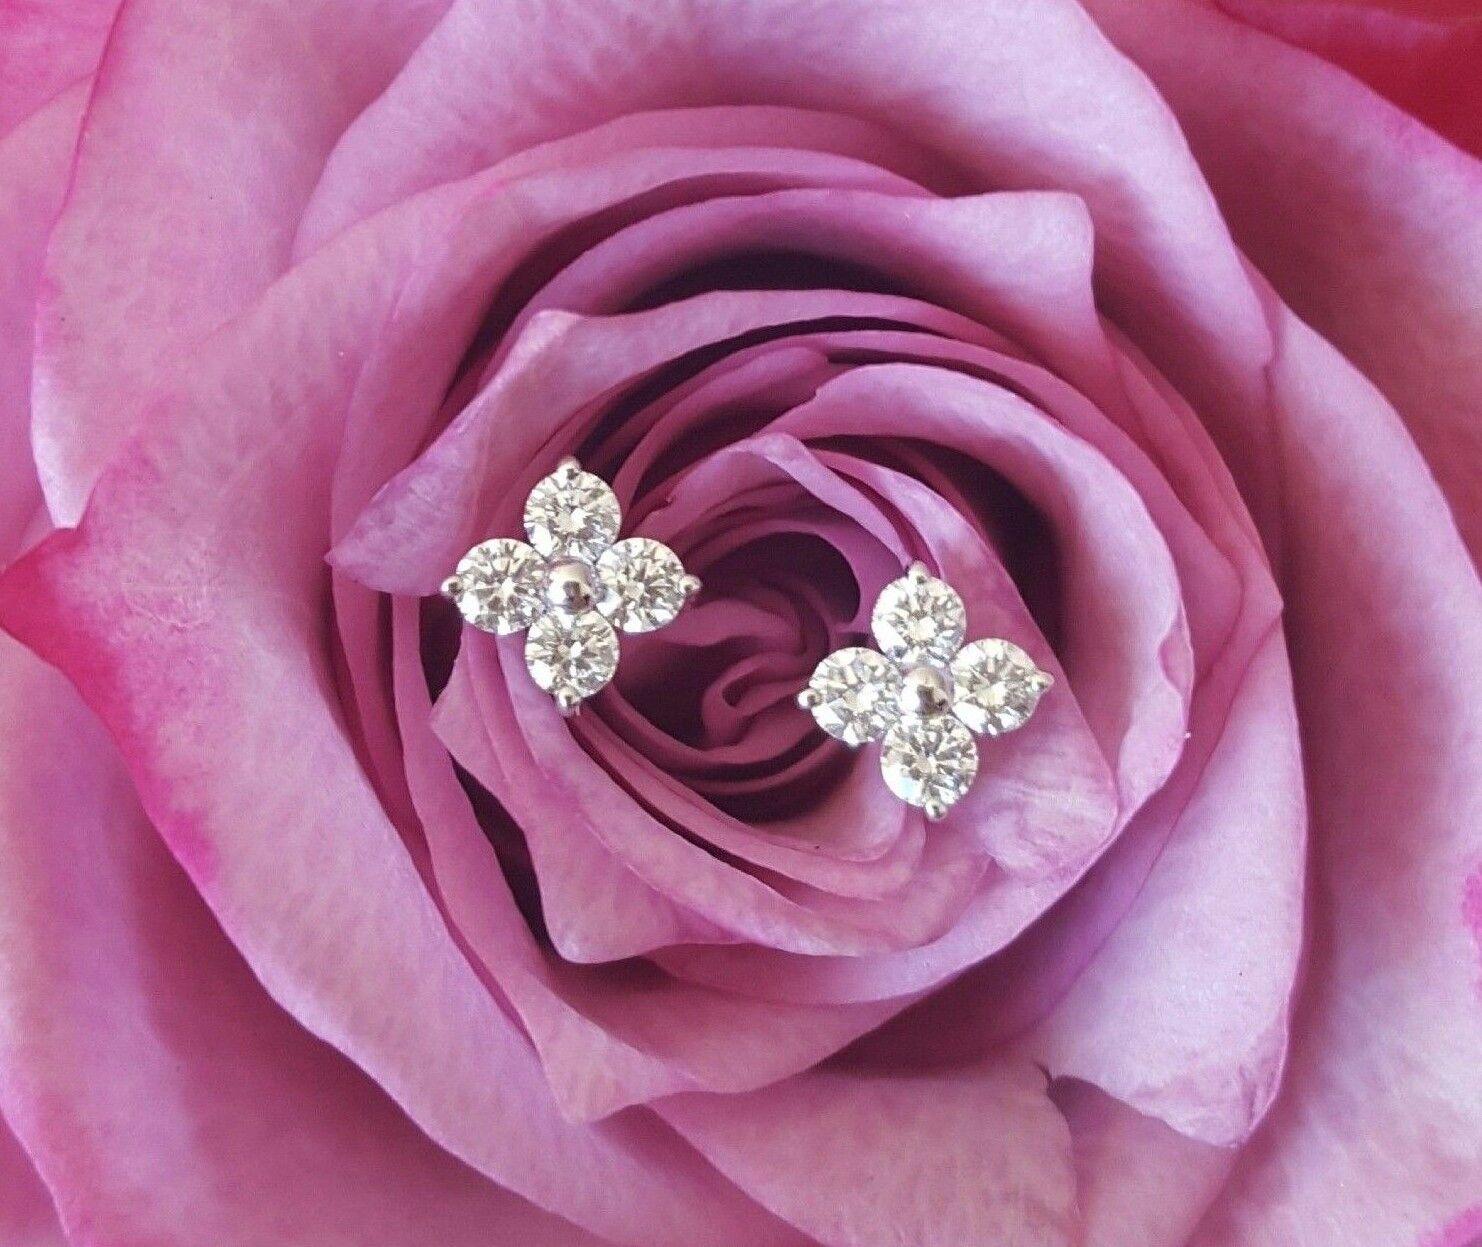 0.24tcw G SI1 Genuine Diamond Stud Earrings in 18k 18ct White gold by CTJ